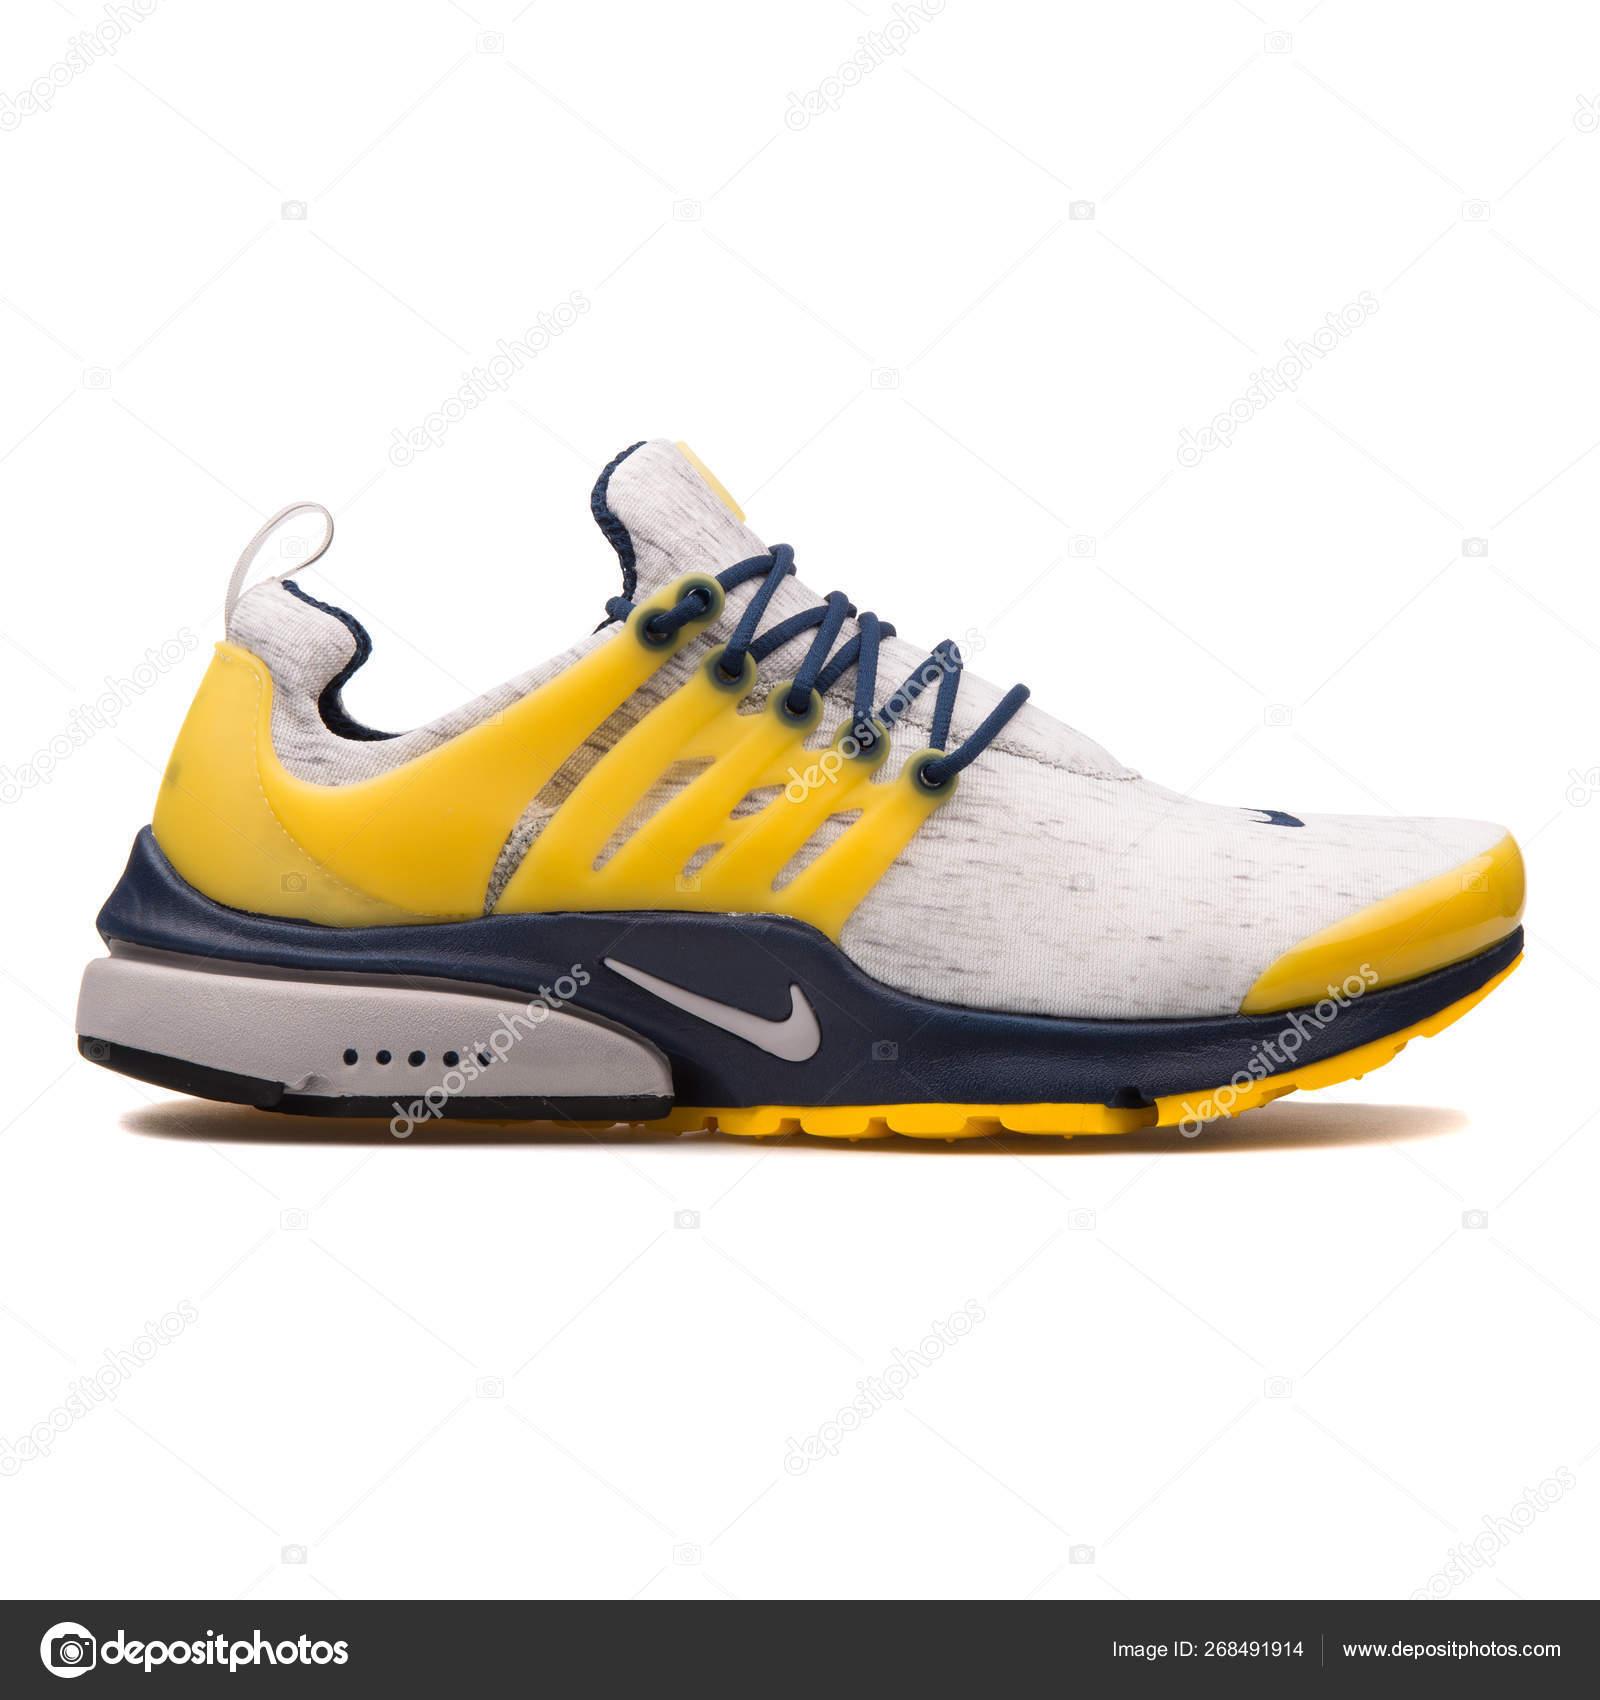 Nike Air Presto grey, navy blue and